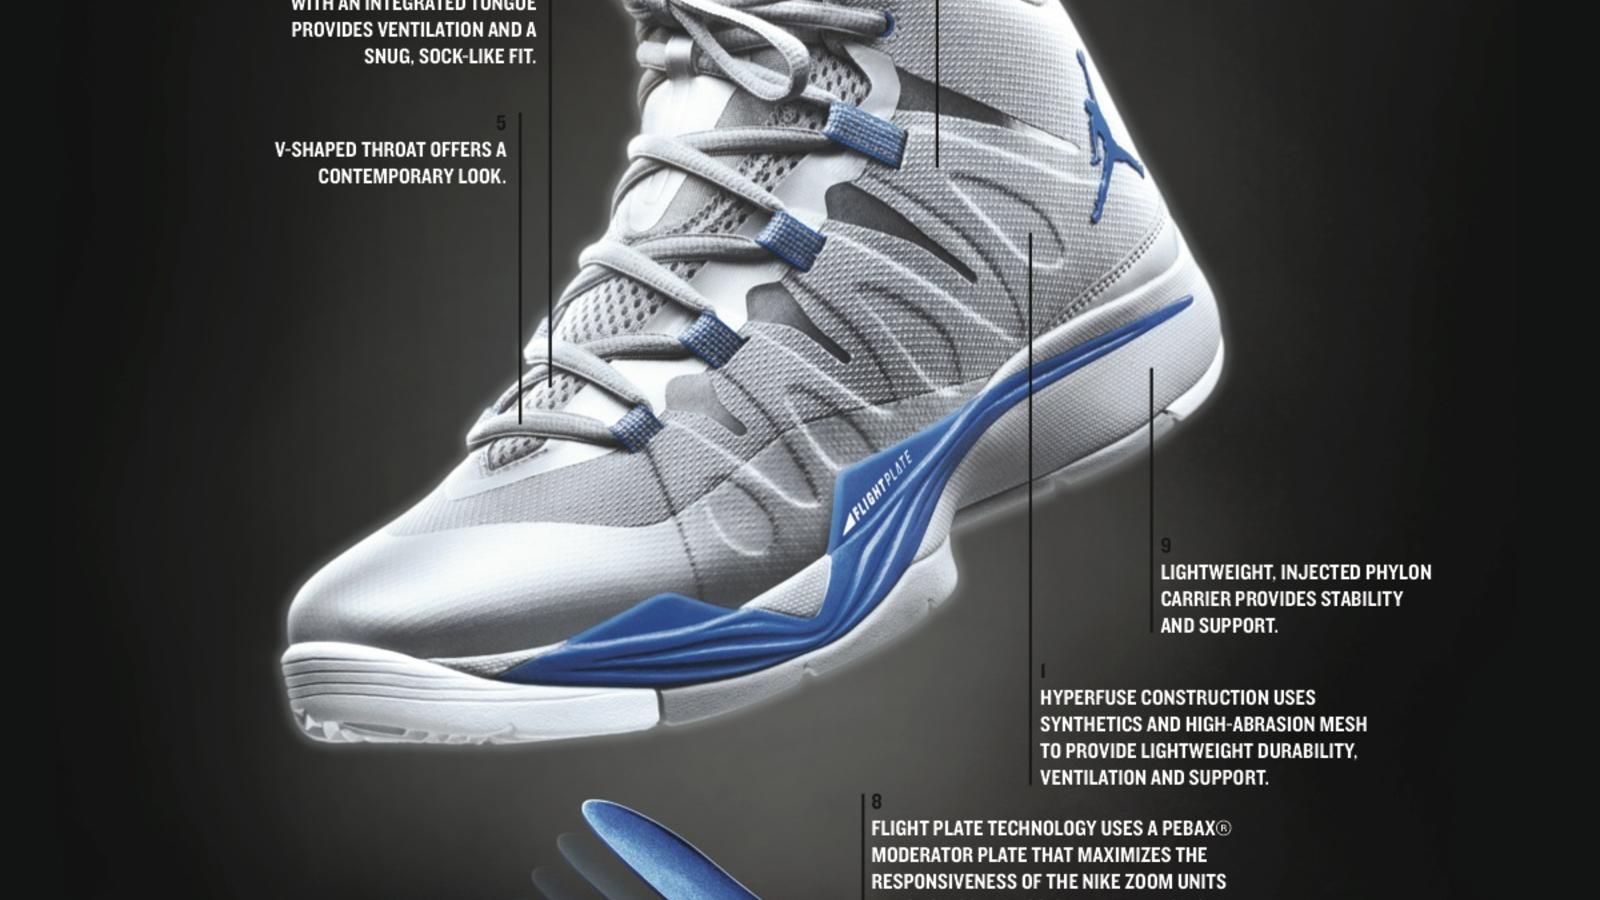 jordan shoes jordan flight plate technology profits 747577